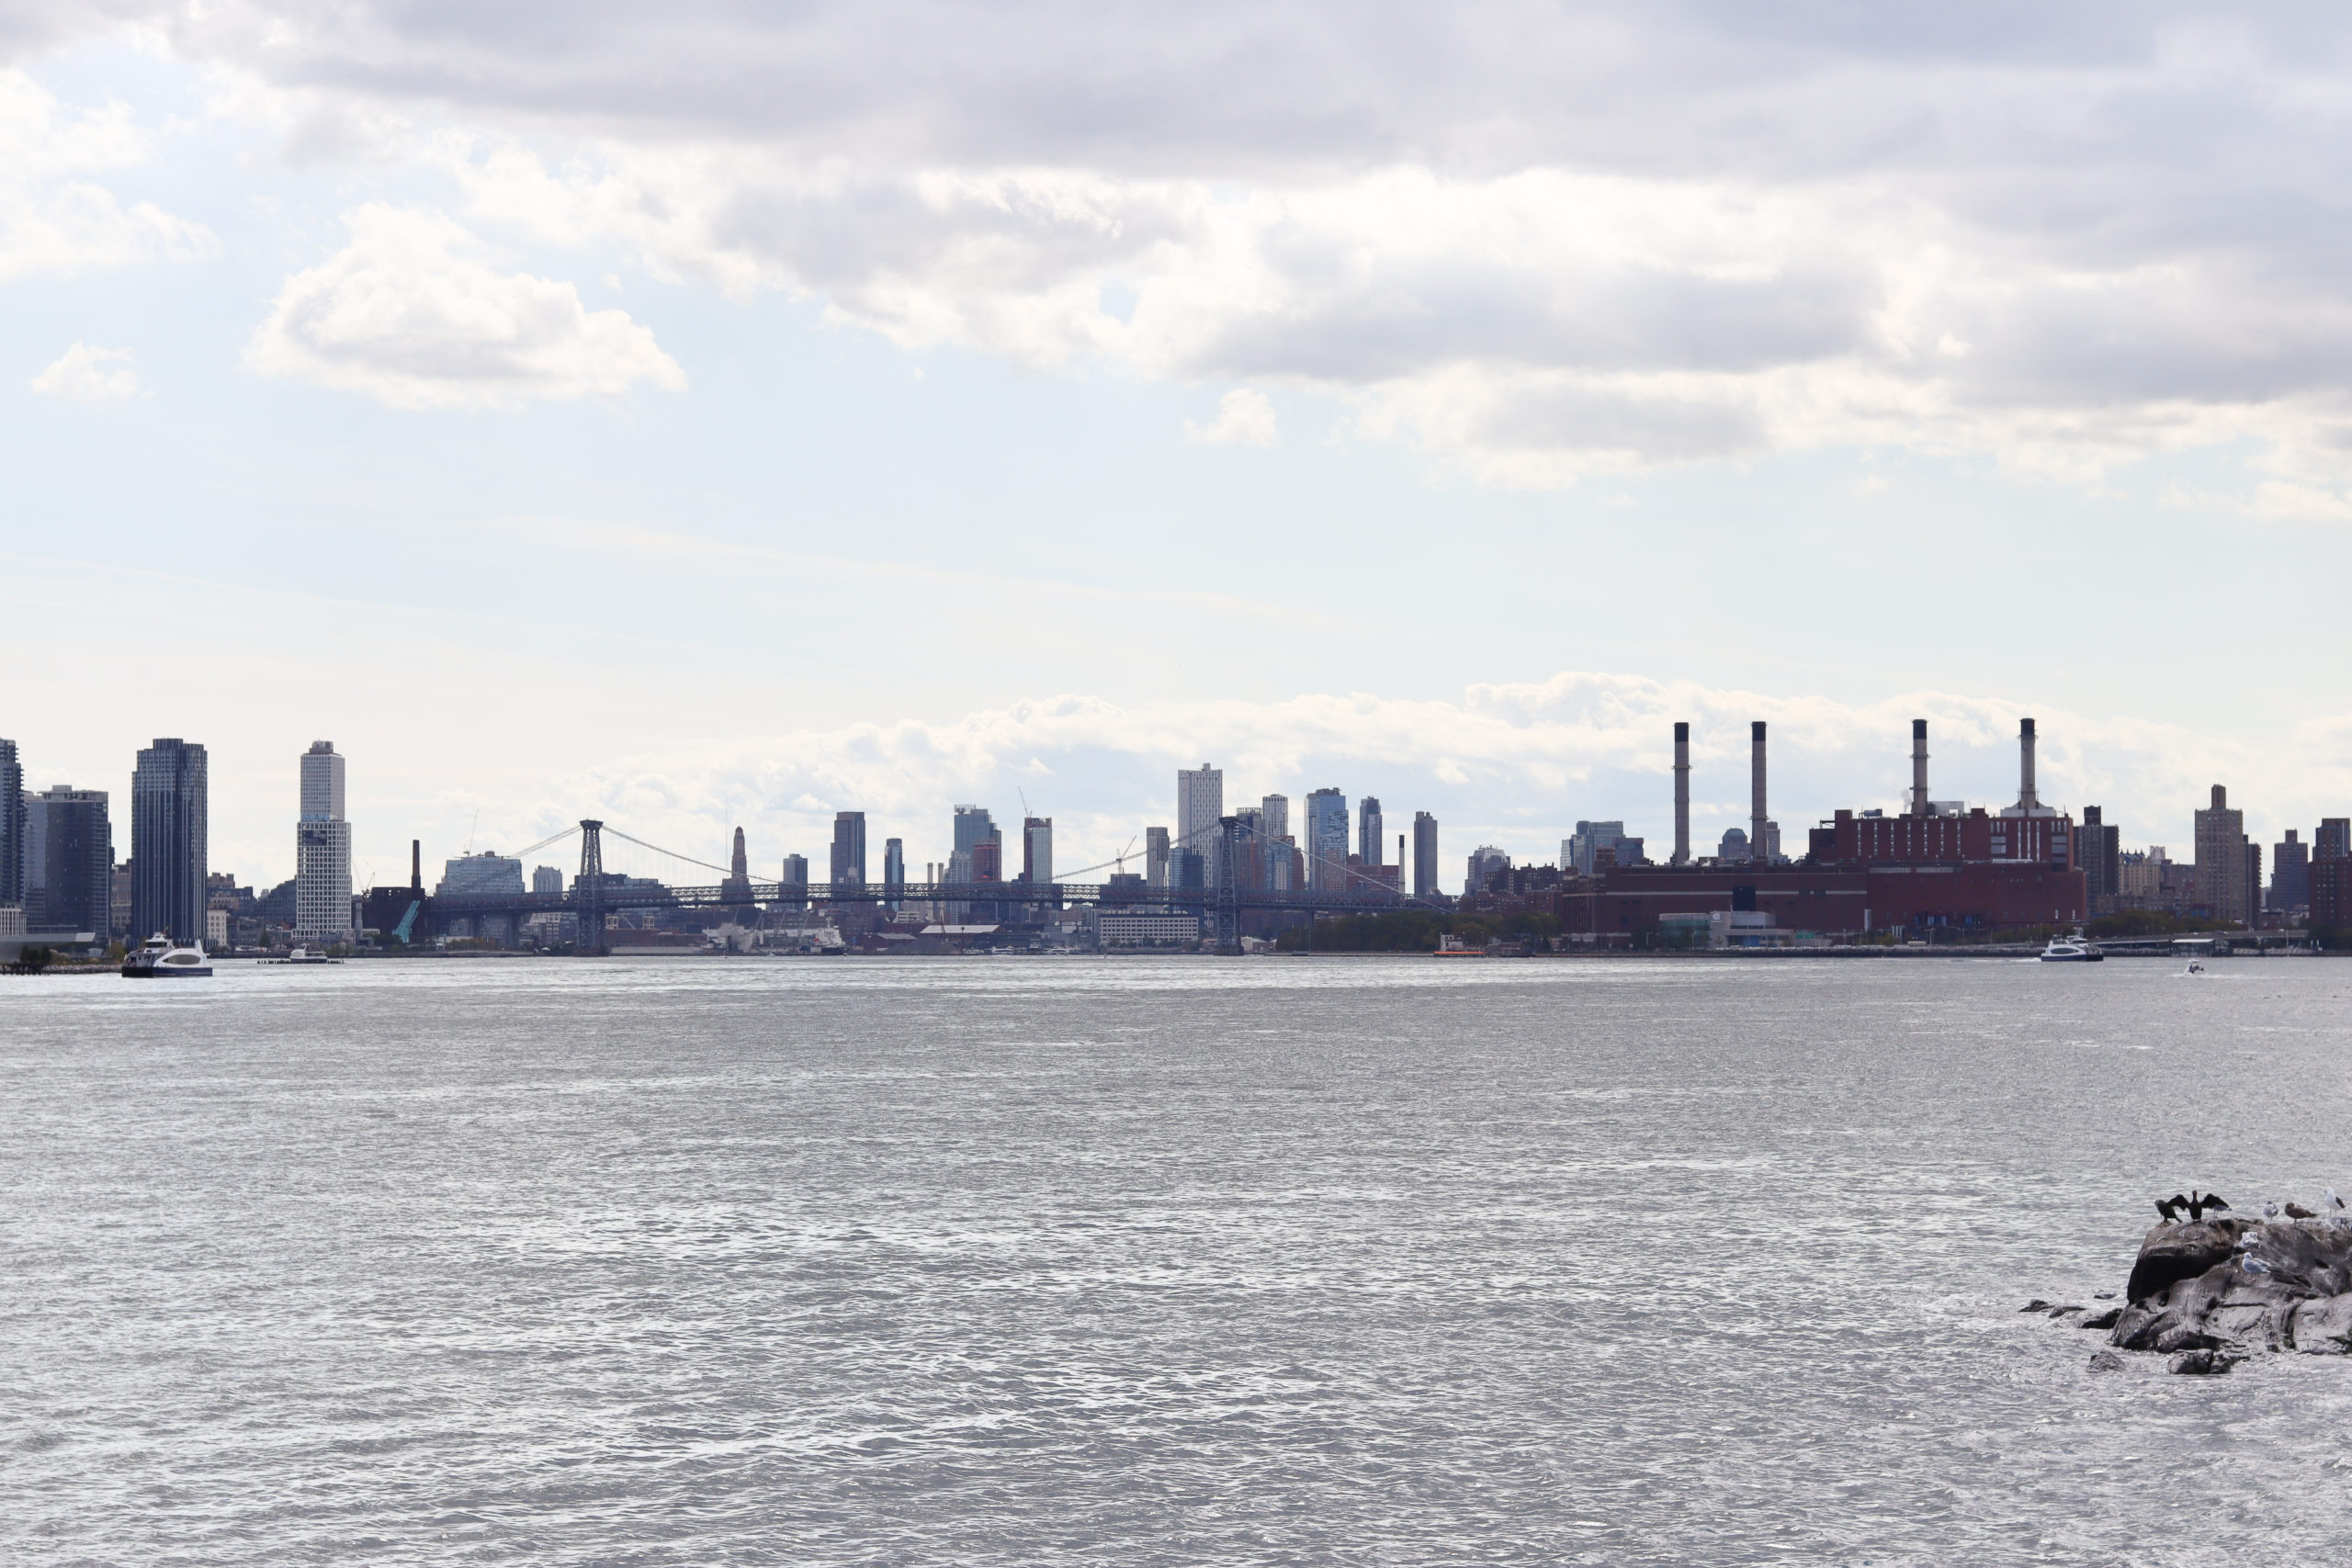 New York City Skyline from Roosevelt Island